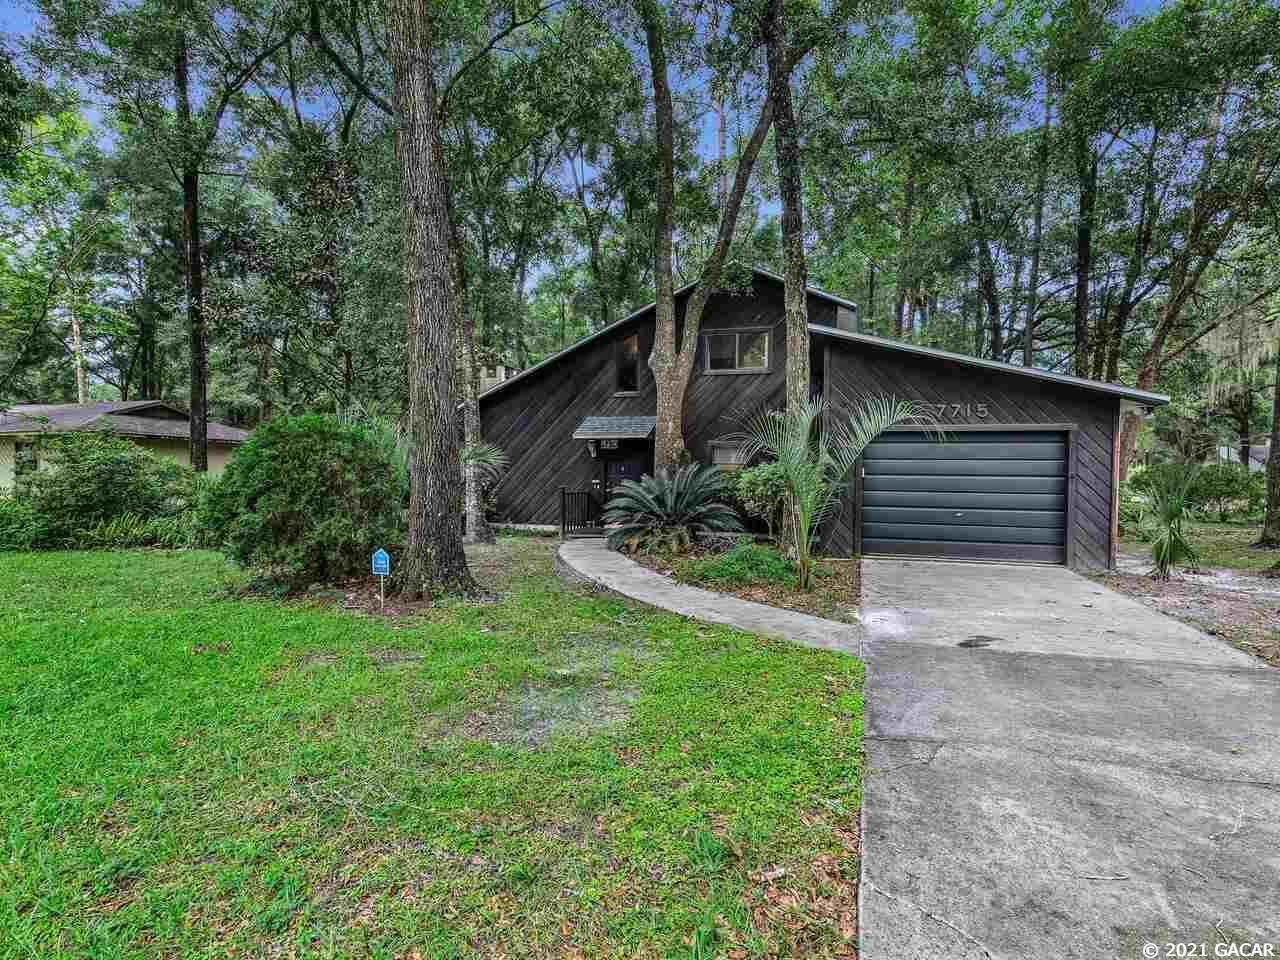 7715 SW 5th Place, Gainesville, FL 32607 - #: 446377